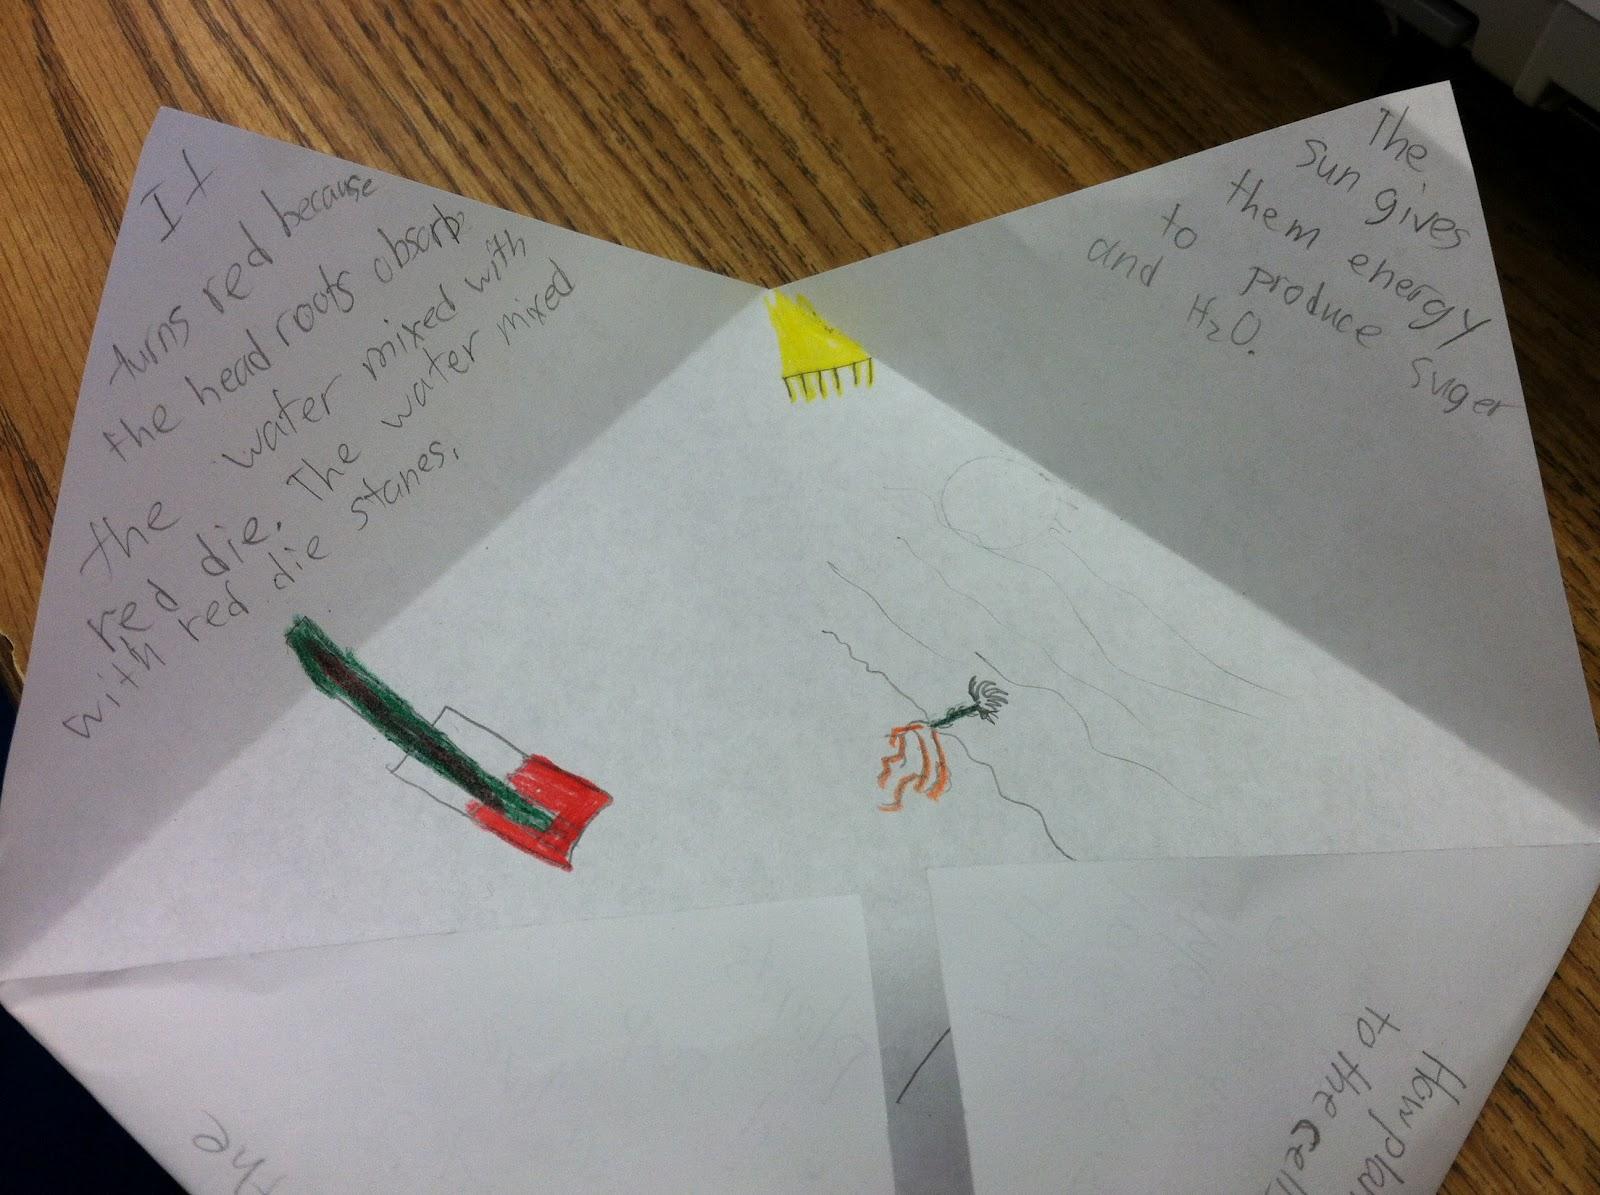 Workbooks scott foresman social studies workbook answers 5th grade : April 2012 - Teaching in Room 6